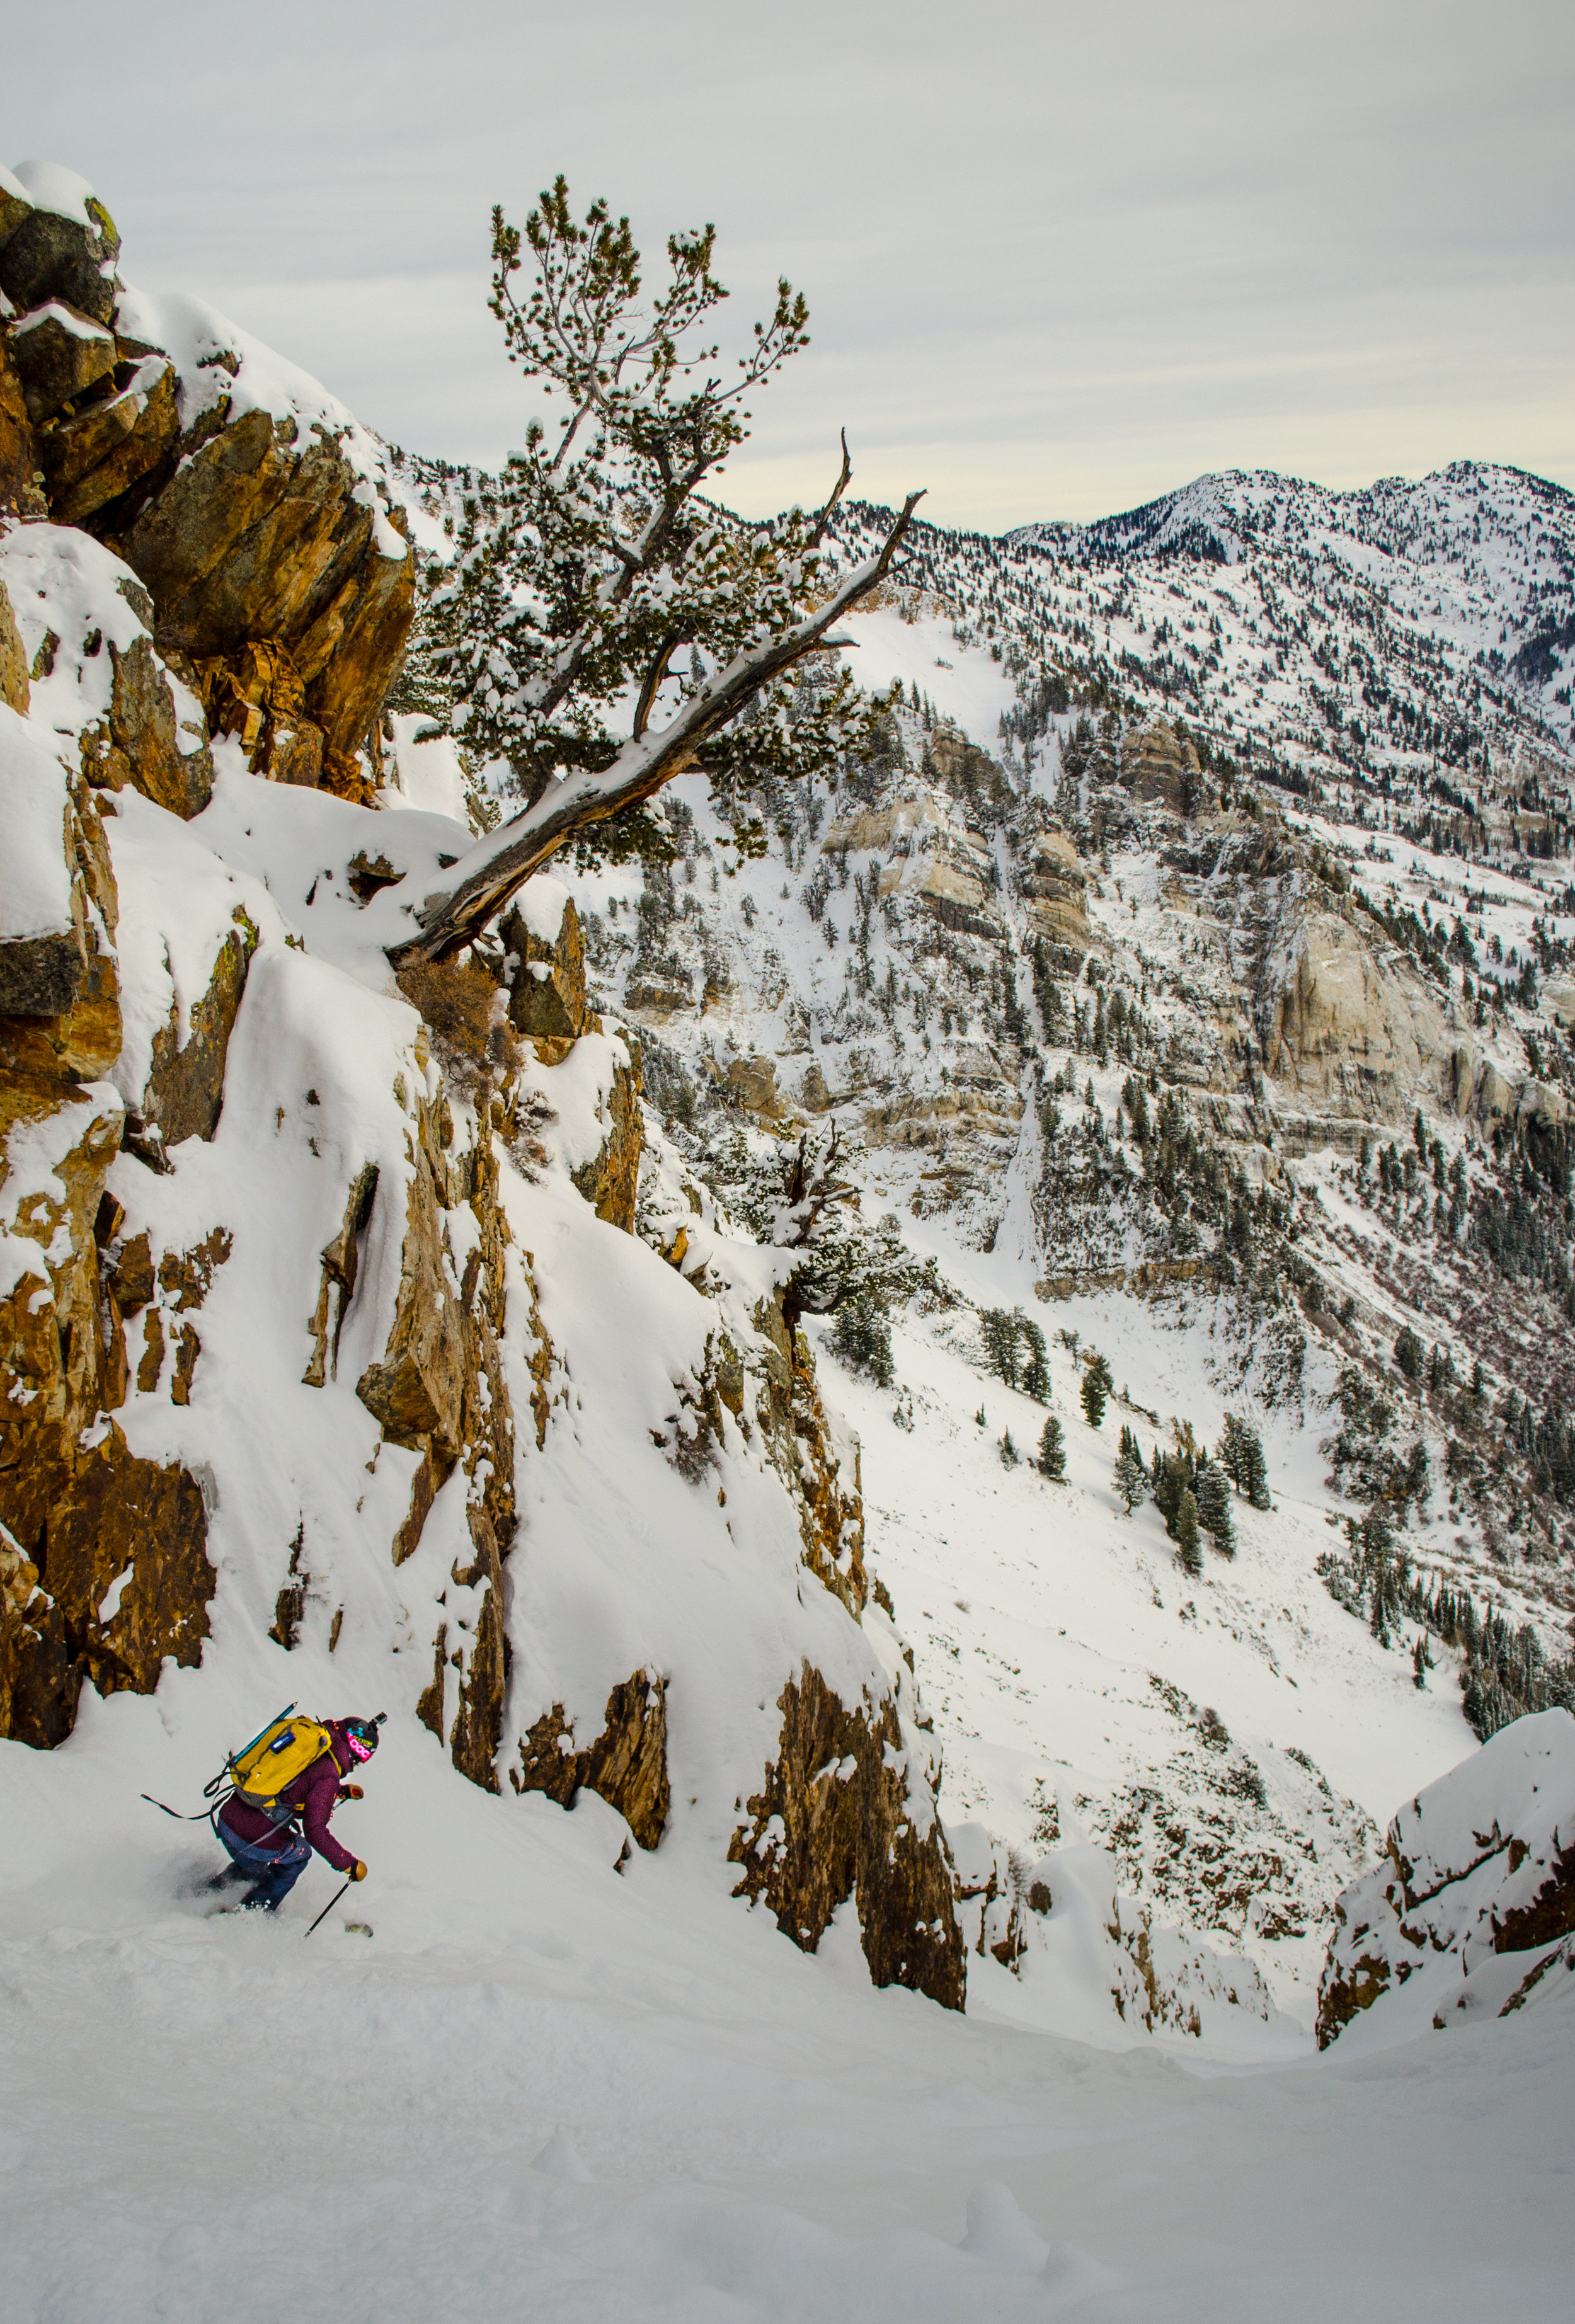 Skiing Utah's Suicide Chute